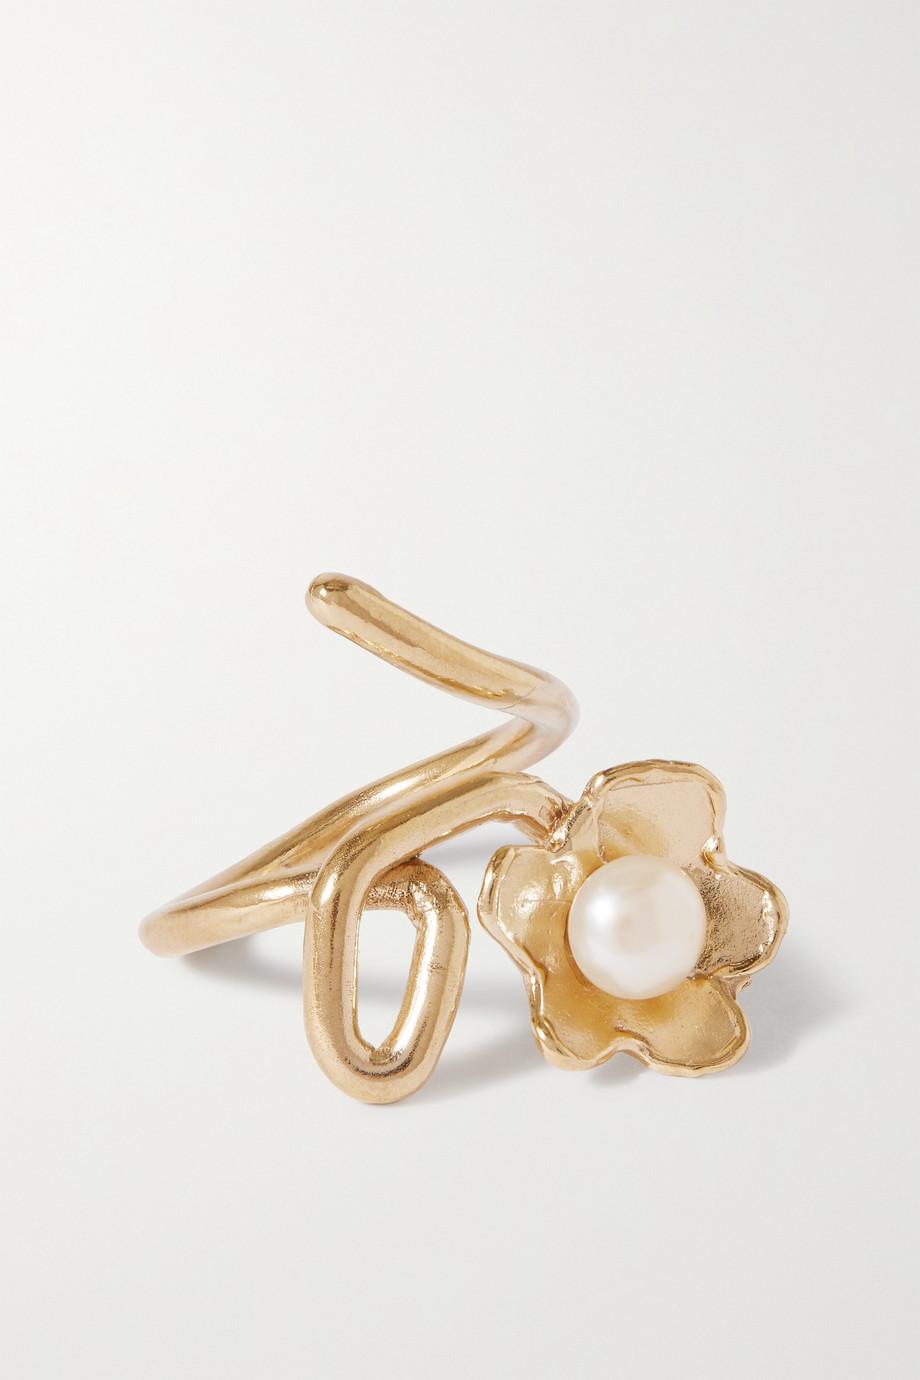 Anita Berisha Bague en plaqué or et perle Daisy Crawler